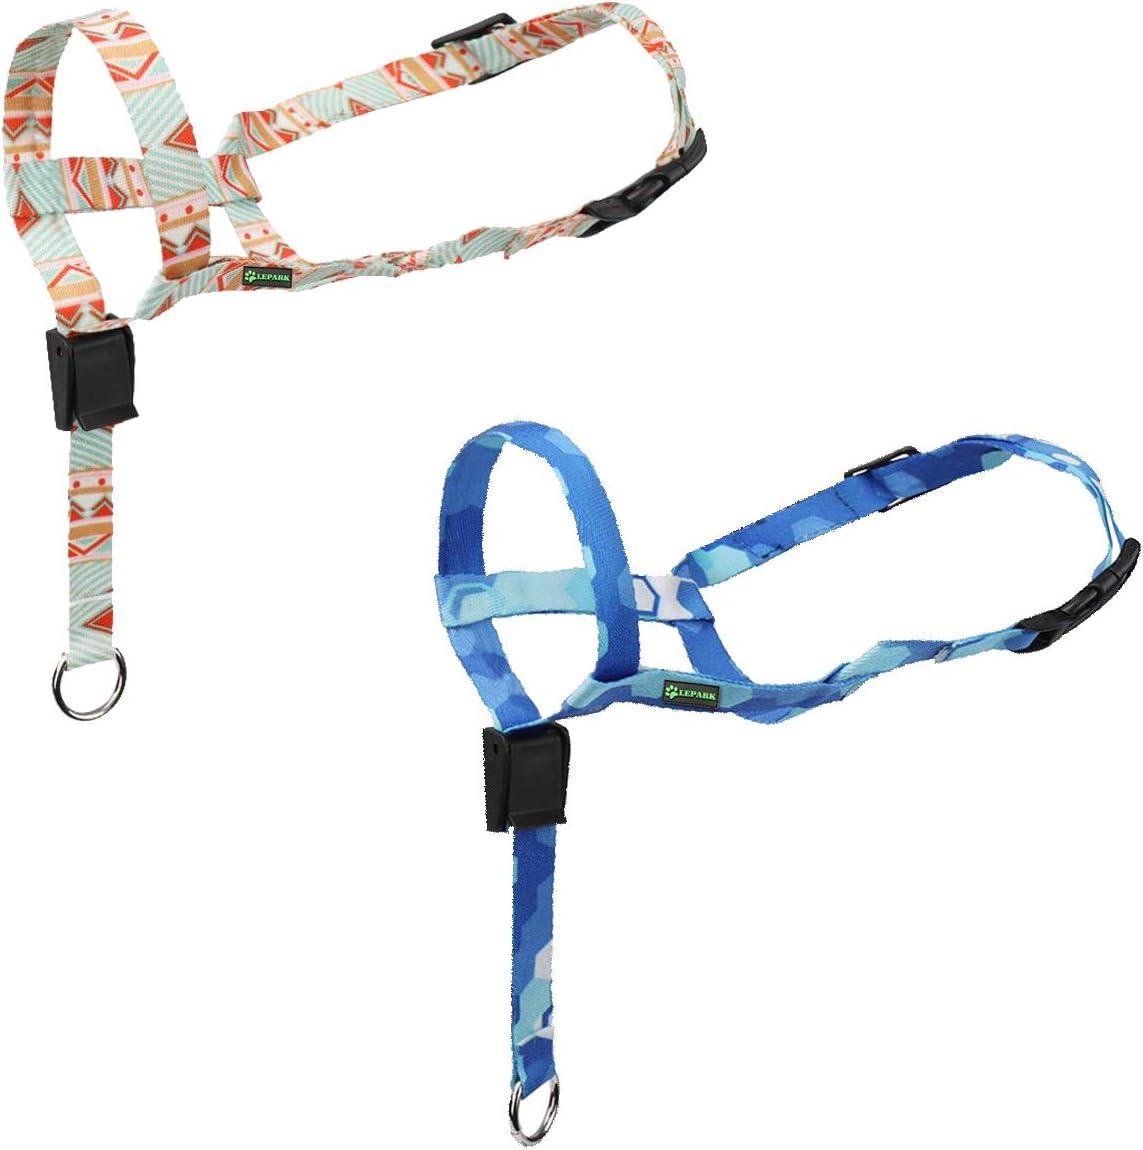 Maulkorb Hund ILEPARK Hunde Maulkorb Hundehalfter aus Leder Einstellbar Hundehalsband-Leder der Ziehen verhindert